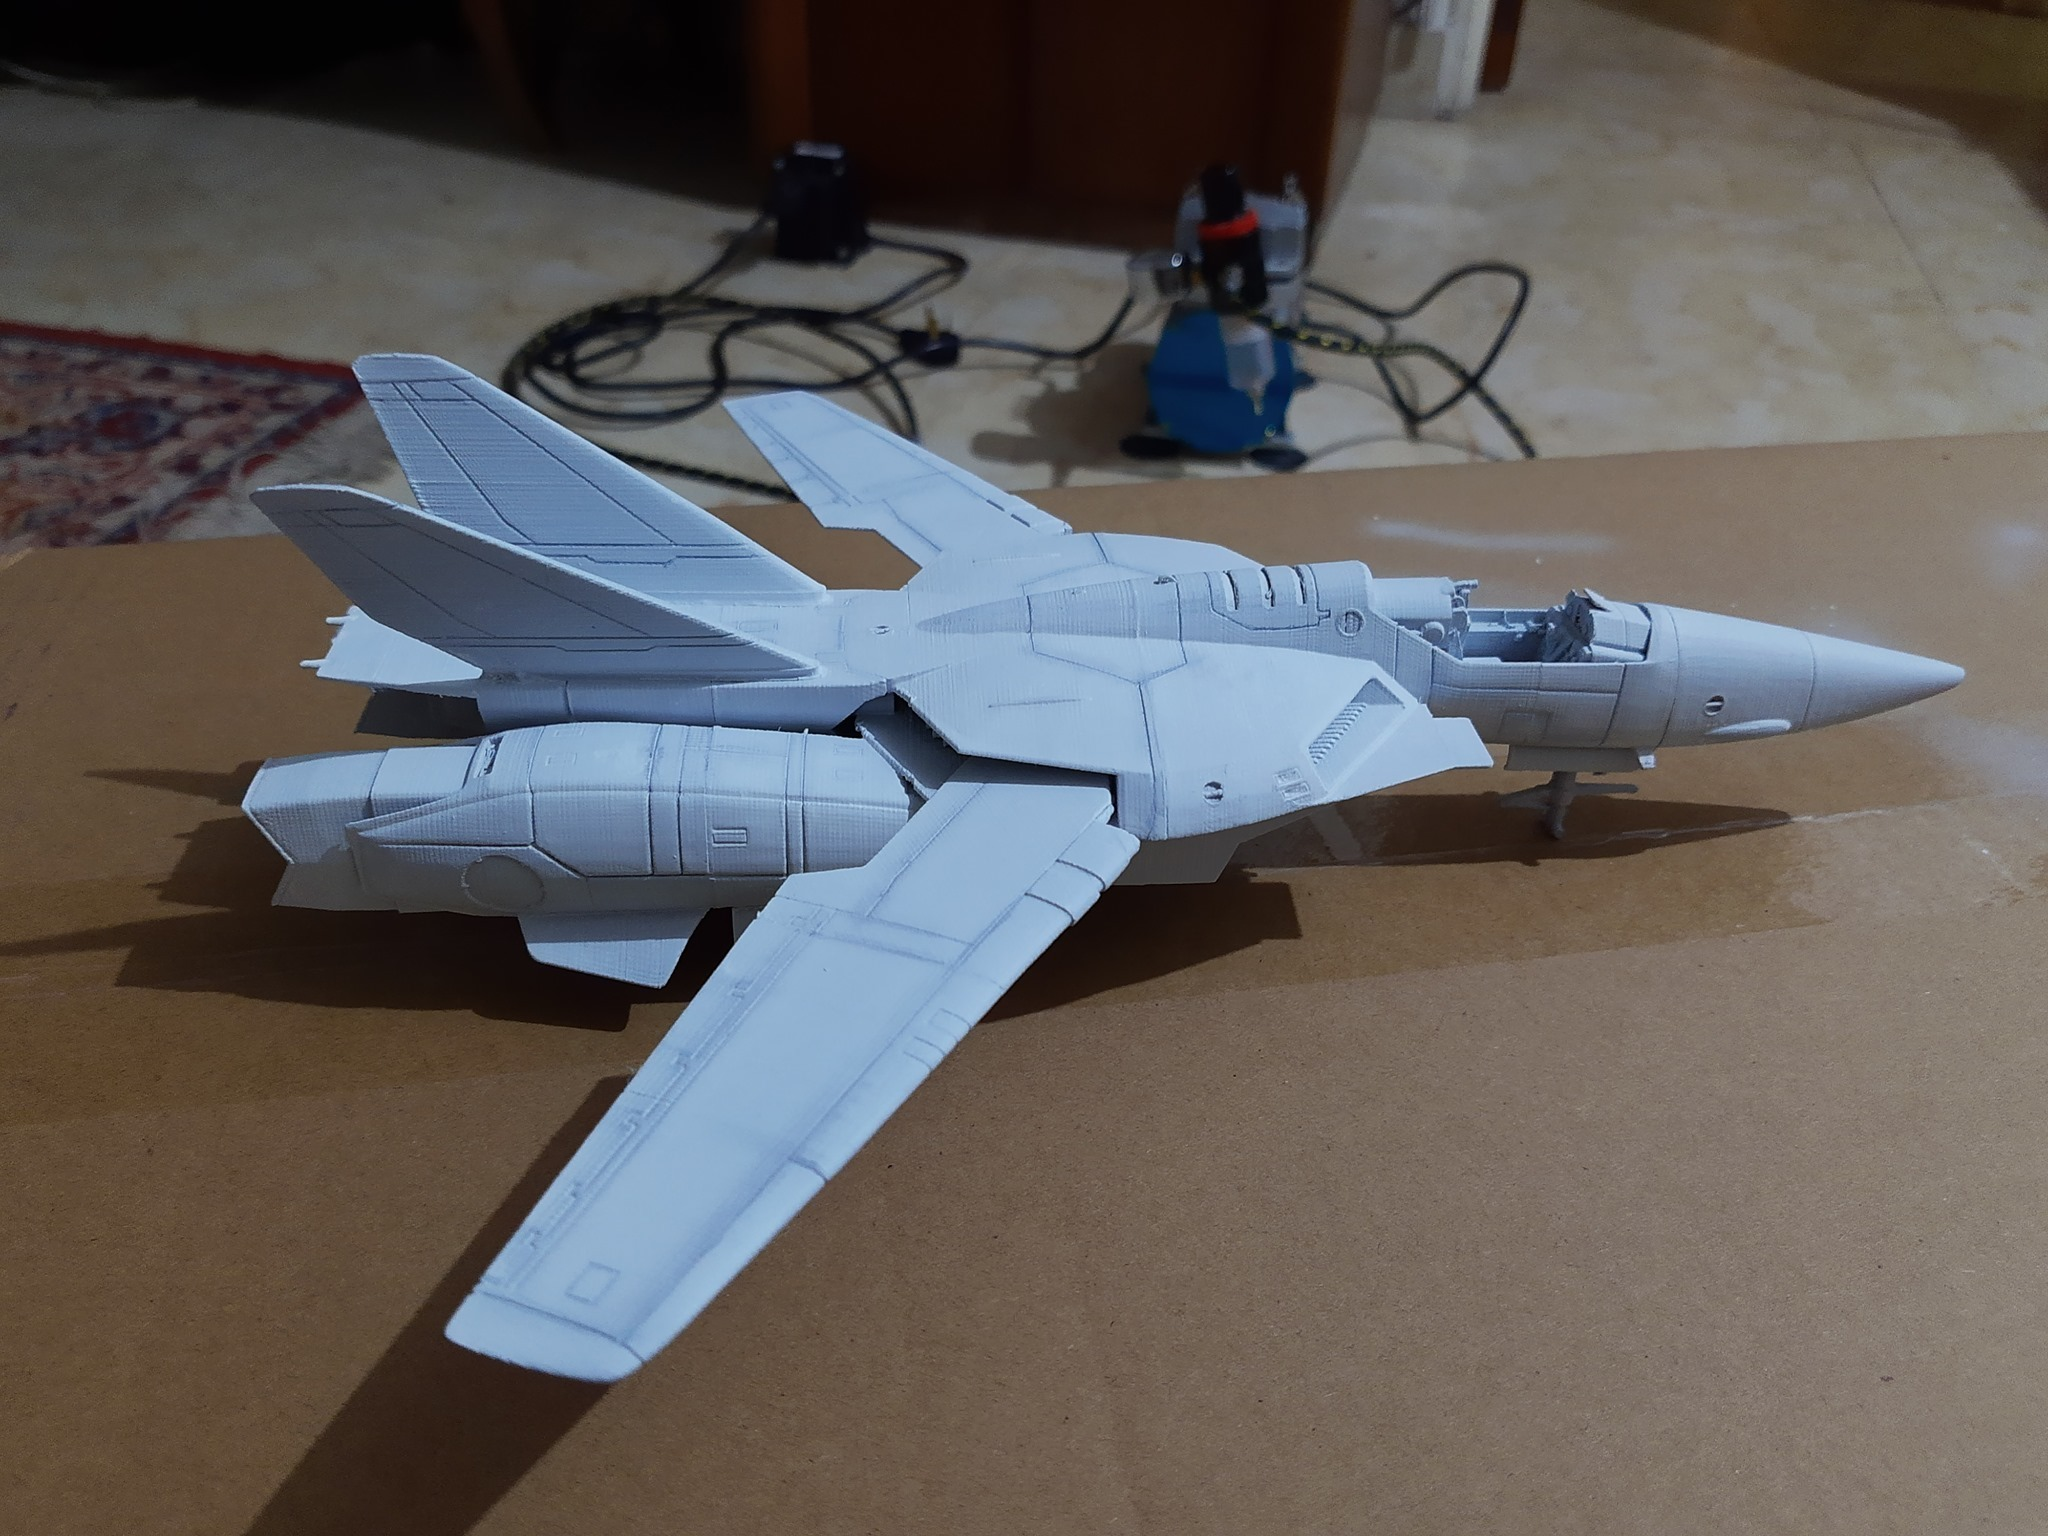 73375491_2825774144121252_7946732332839337984_n.jpg Download STL file Vf1 Robotech V2.0 • 3D printable template, Nico_3D